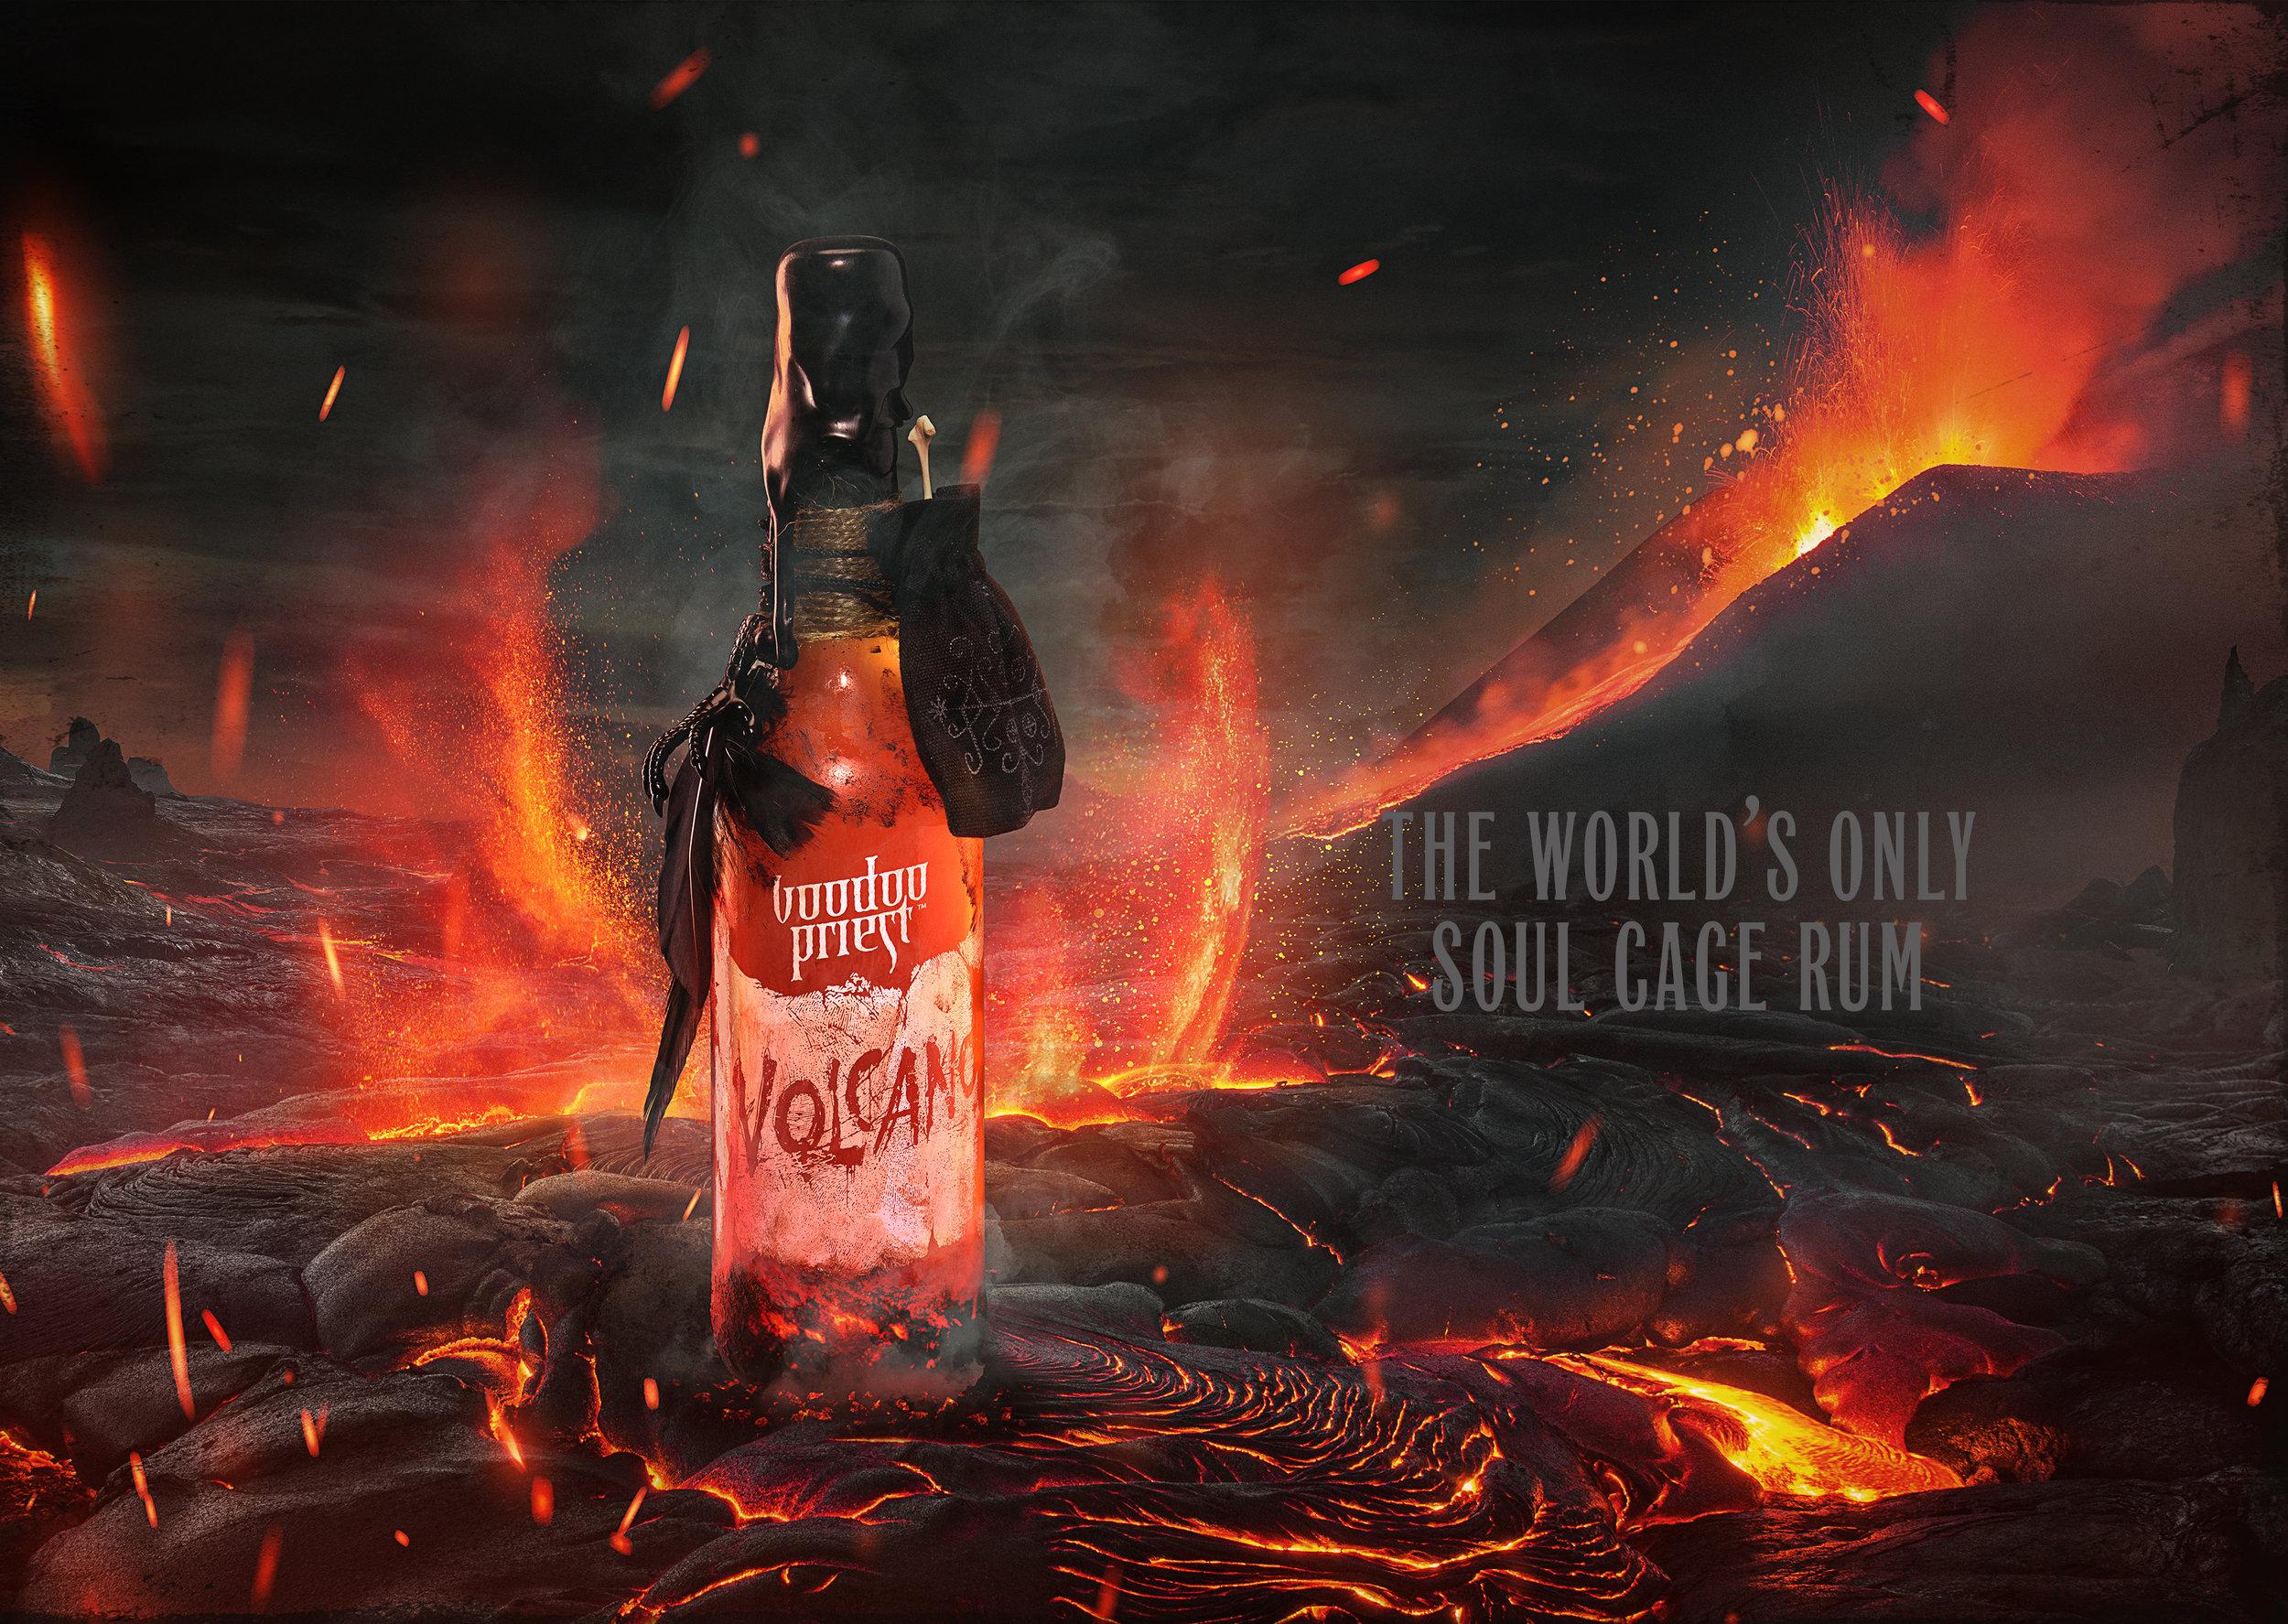 Braue :: Brand Design Experts - Voodoo Priest Volcano10.jpg